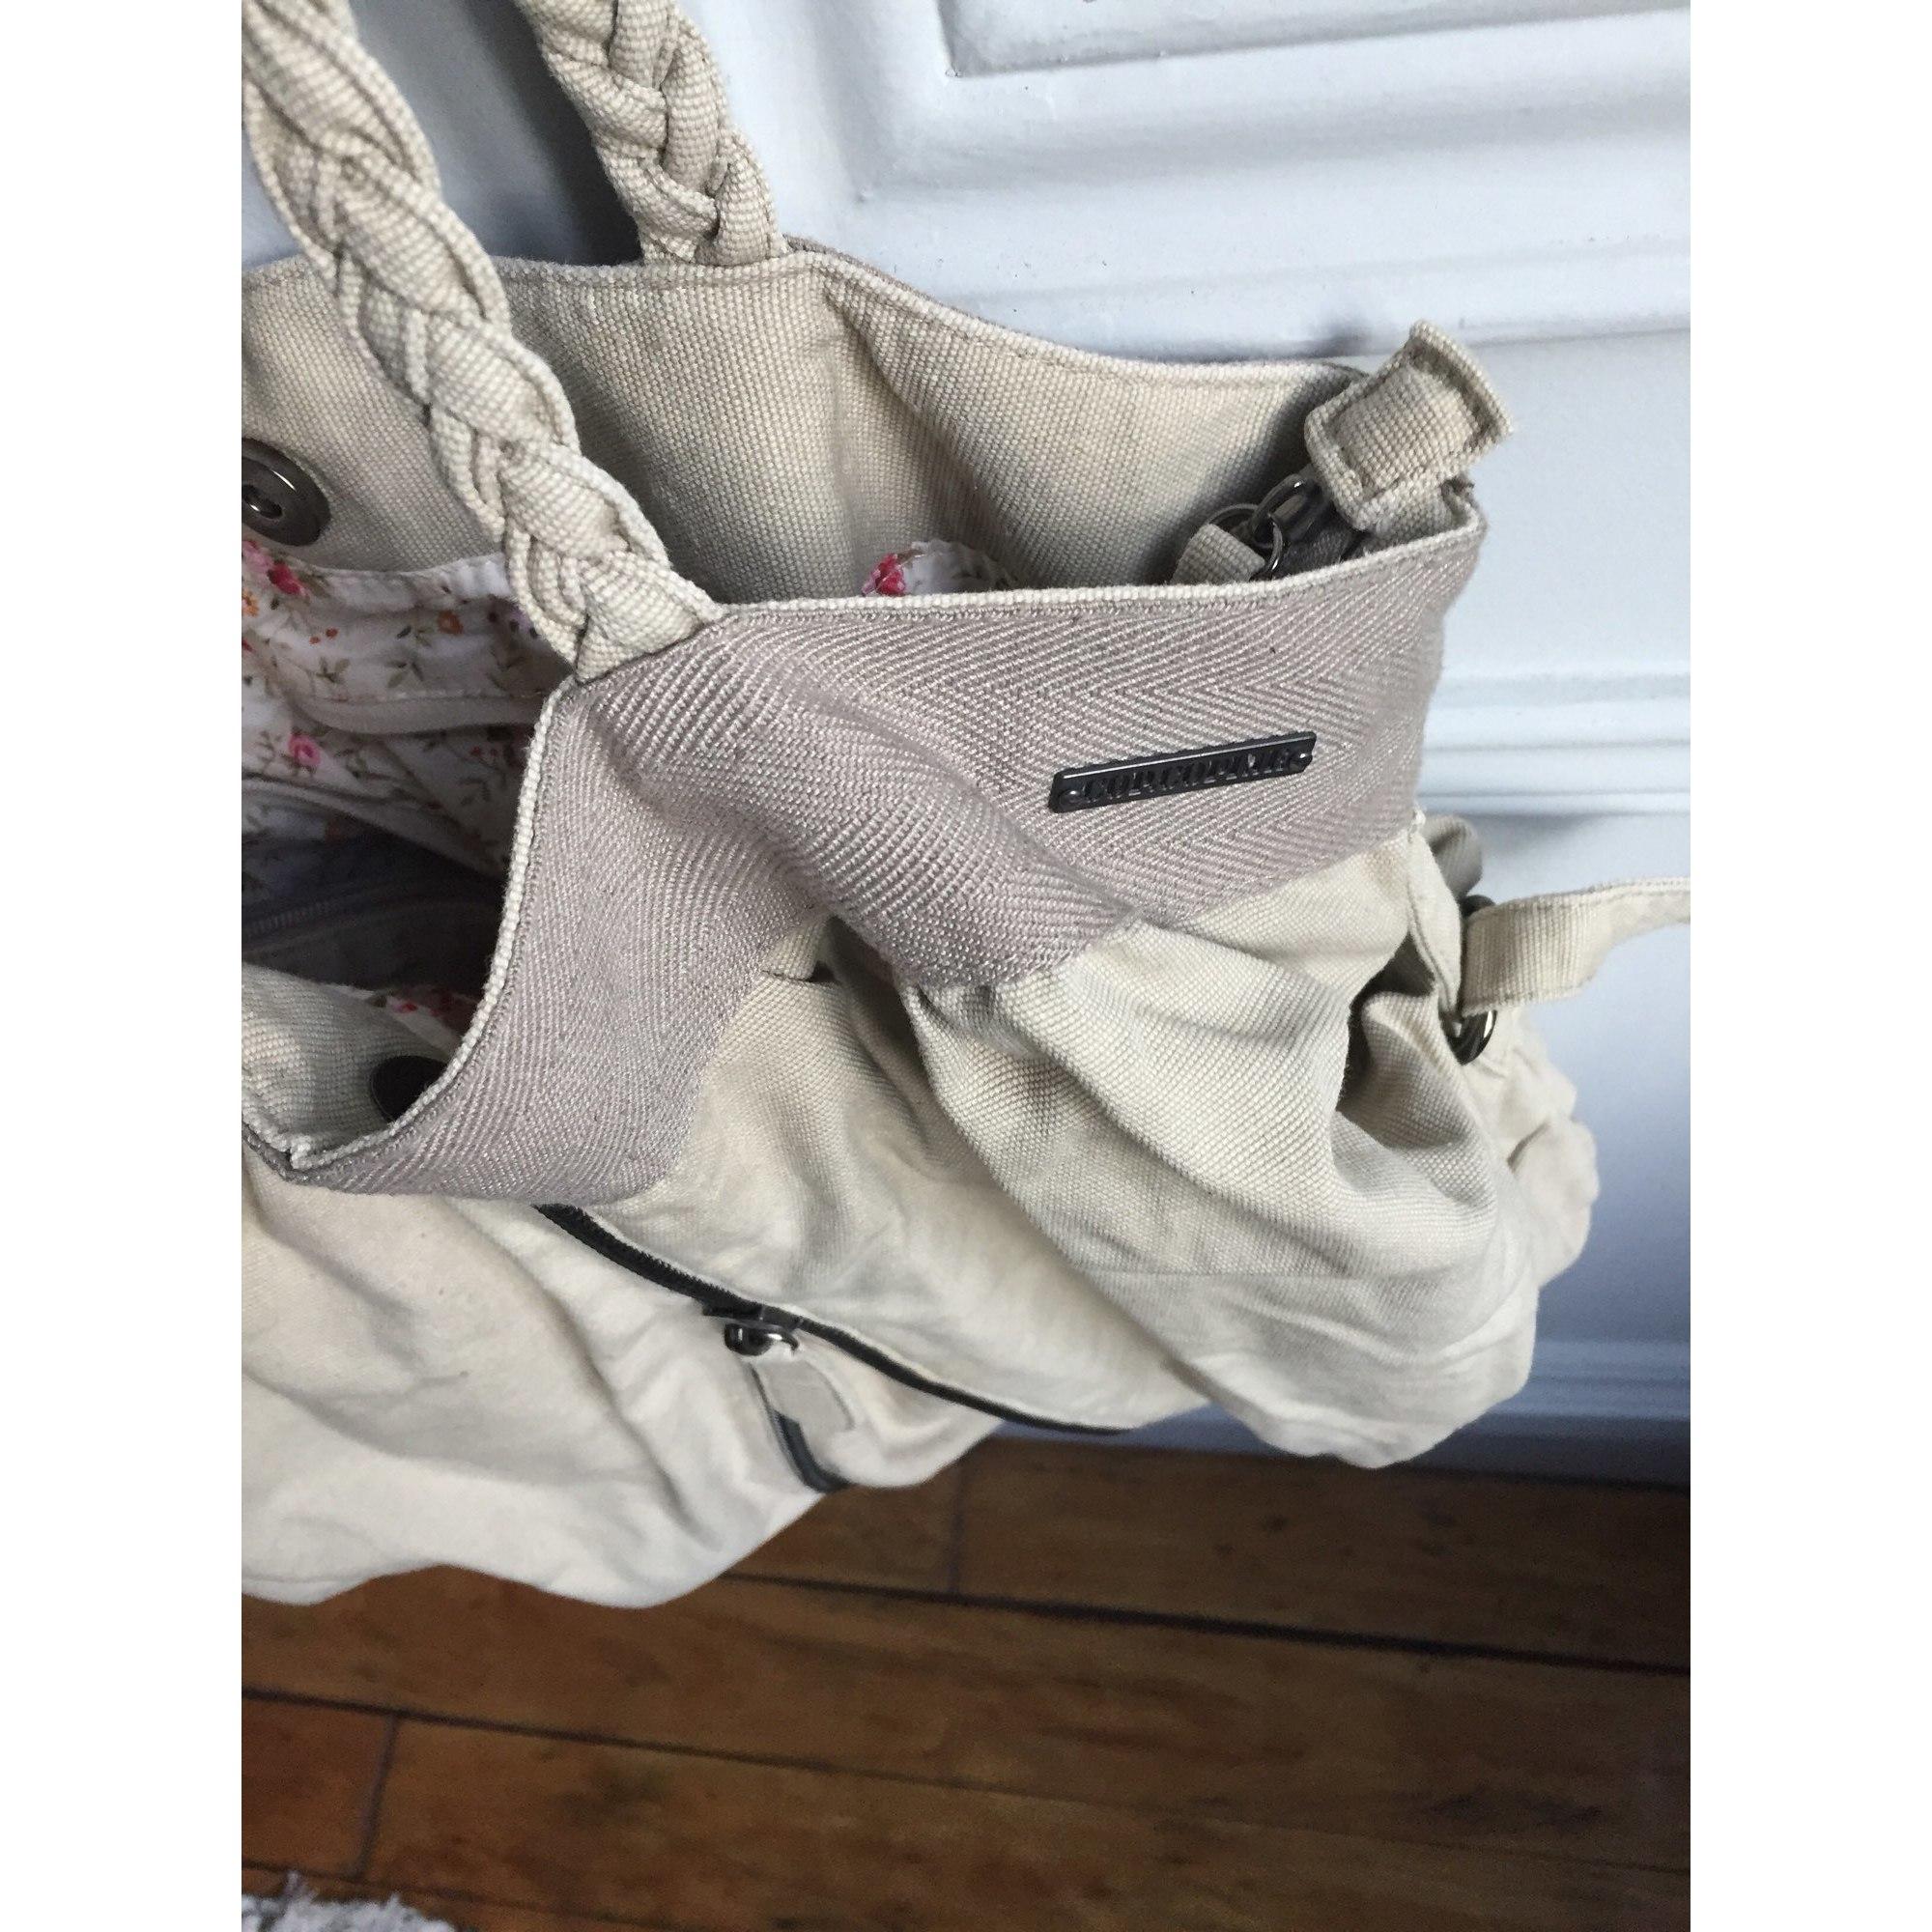 Sac à main en tissu COP-COPINE coton beige